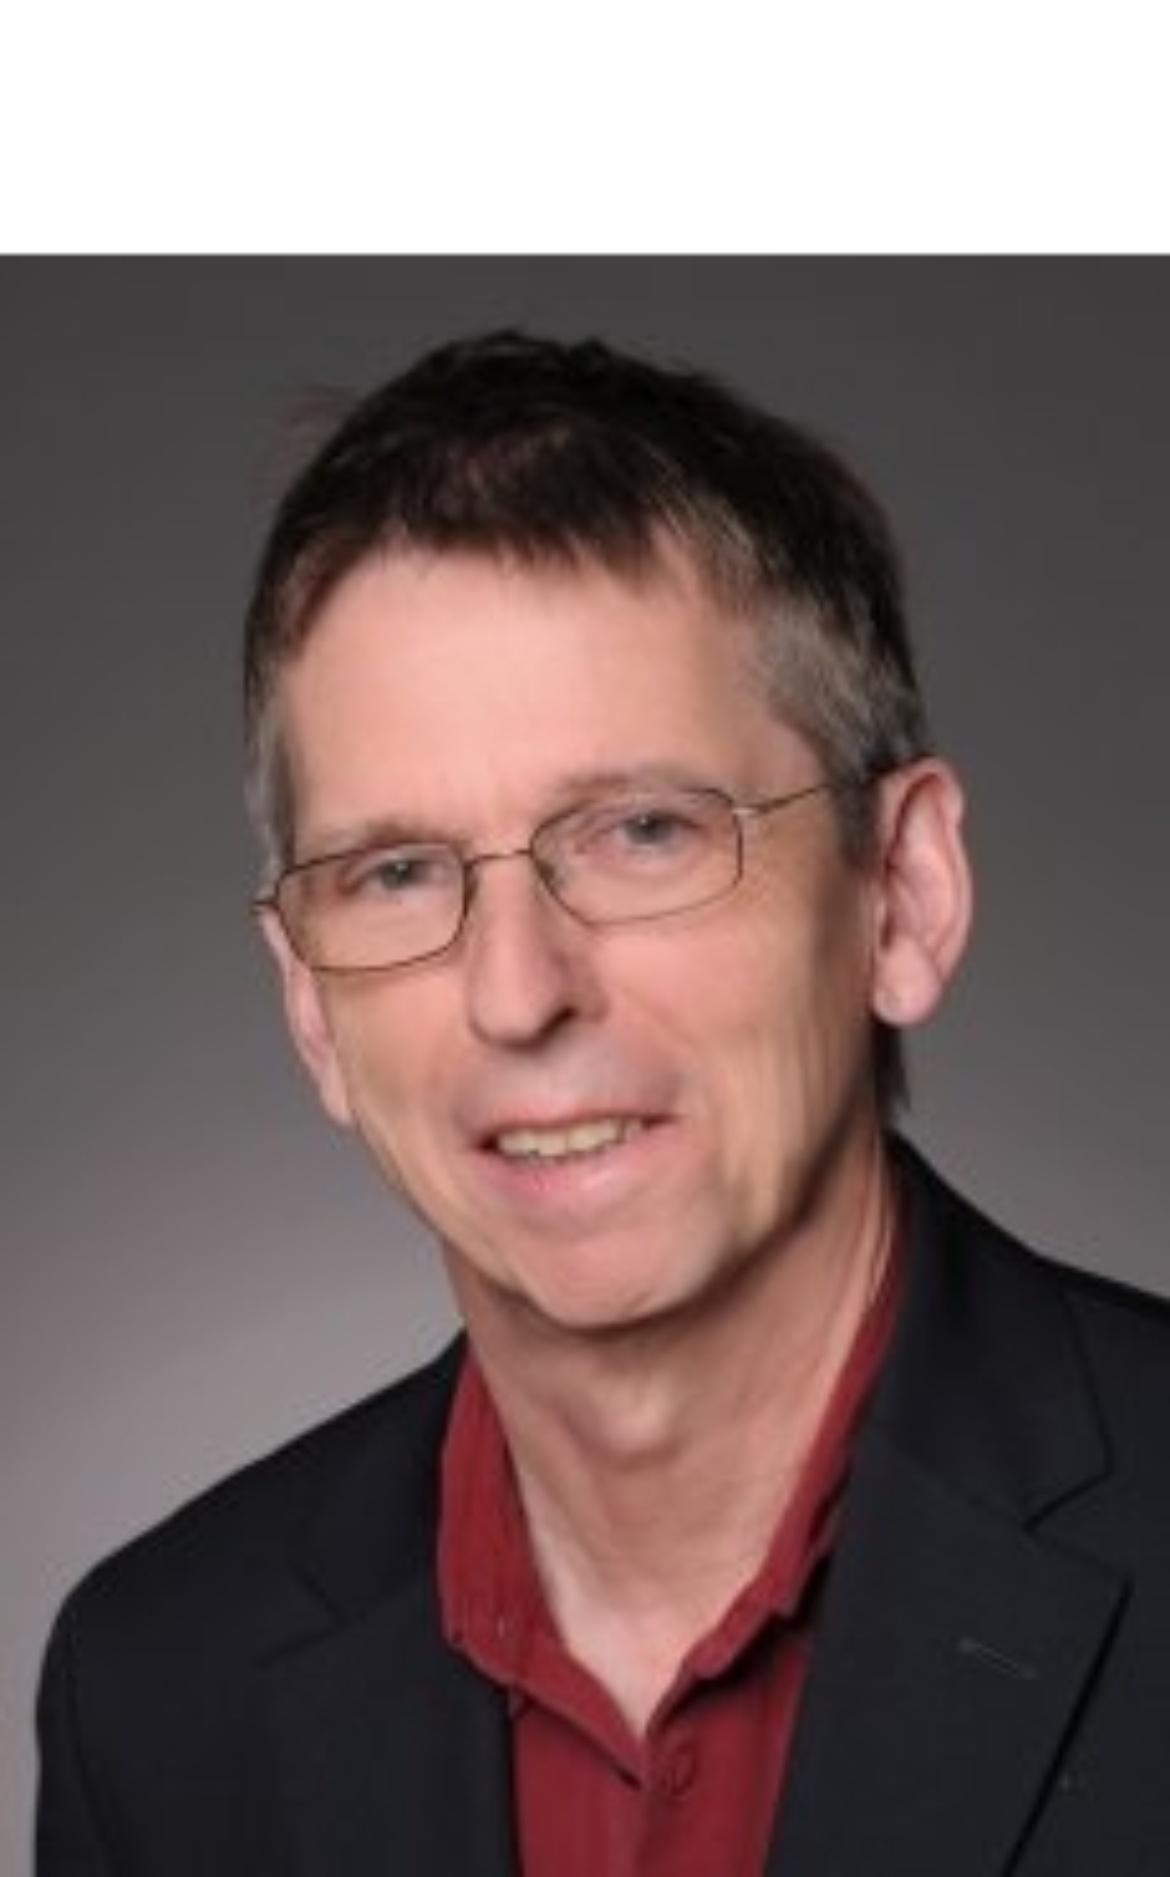 Prof. Dr. rer. nat. habil. Hans-Joachim Wunderlich, Lehrstuhlinhaber Rechnerarchitektur (c)